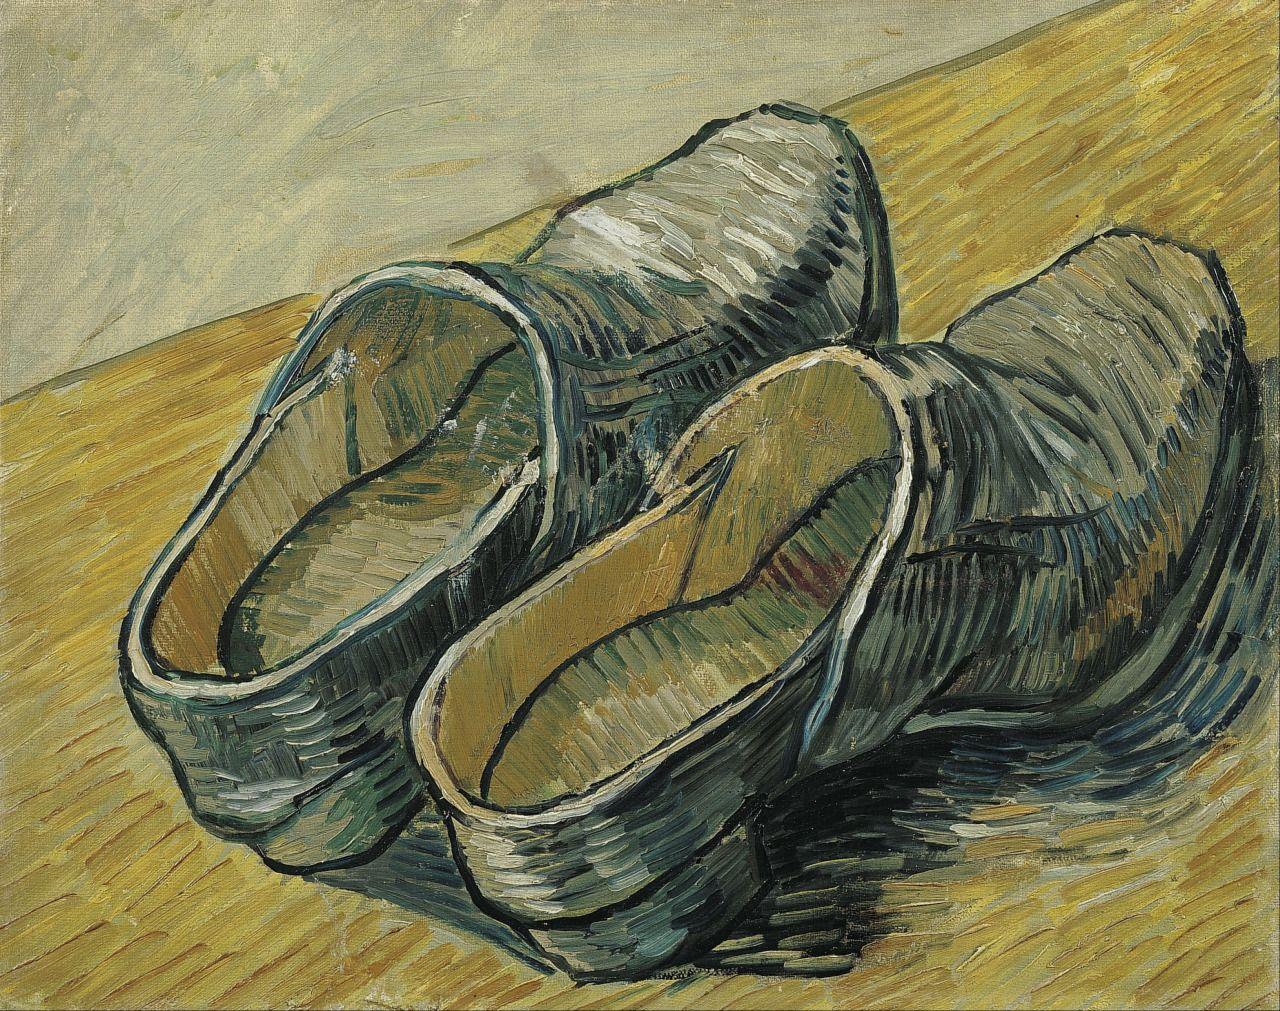 Pinterest Van Vincent Van Vincent GoghPinturas Modernistas nw80OXPk